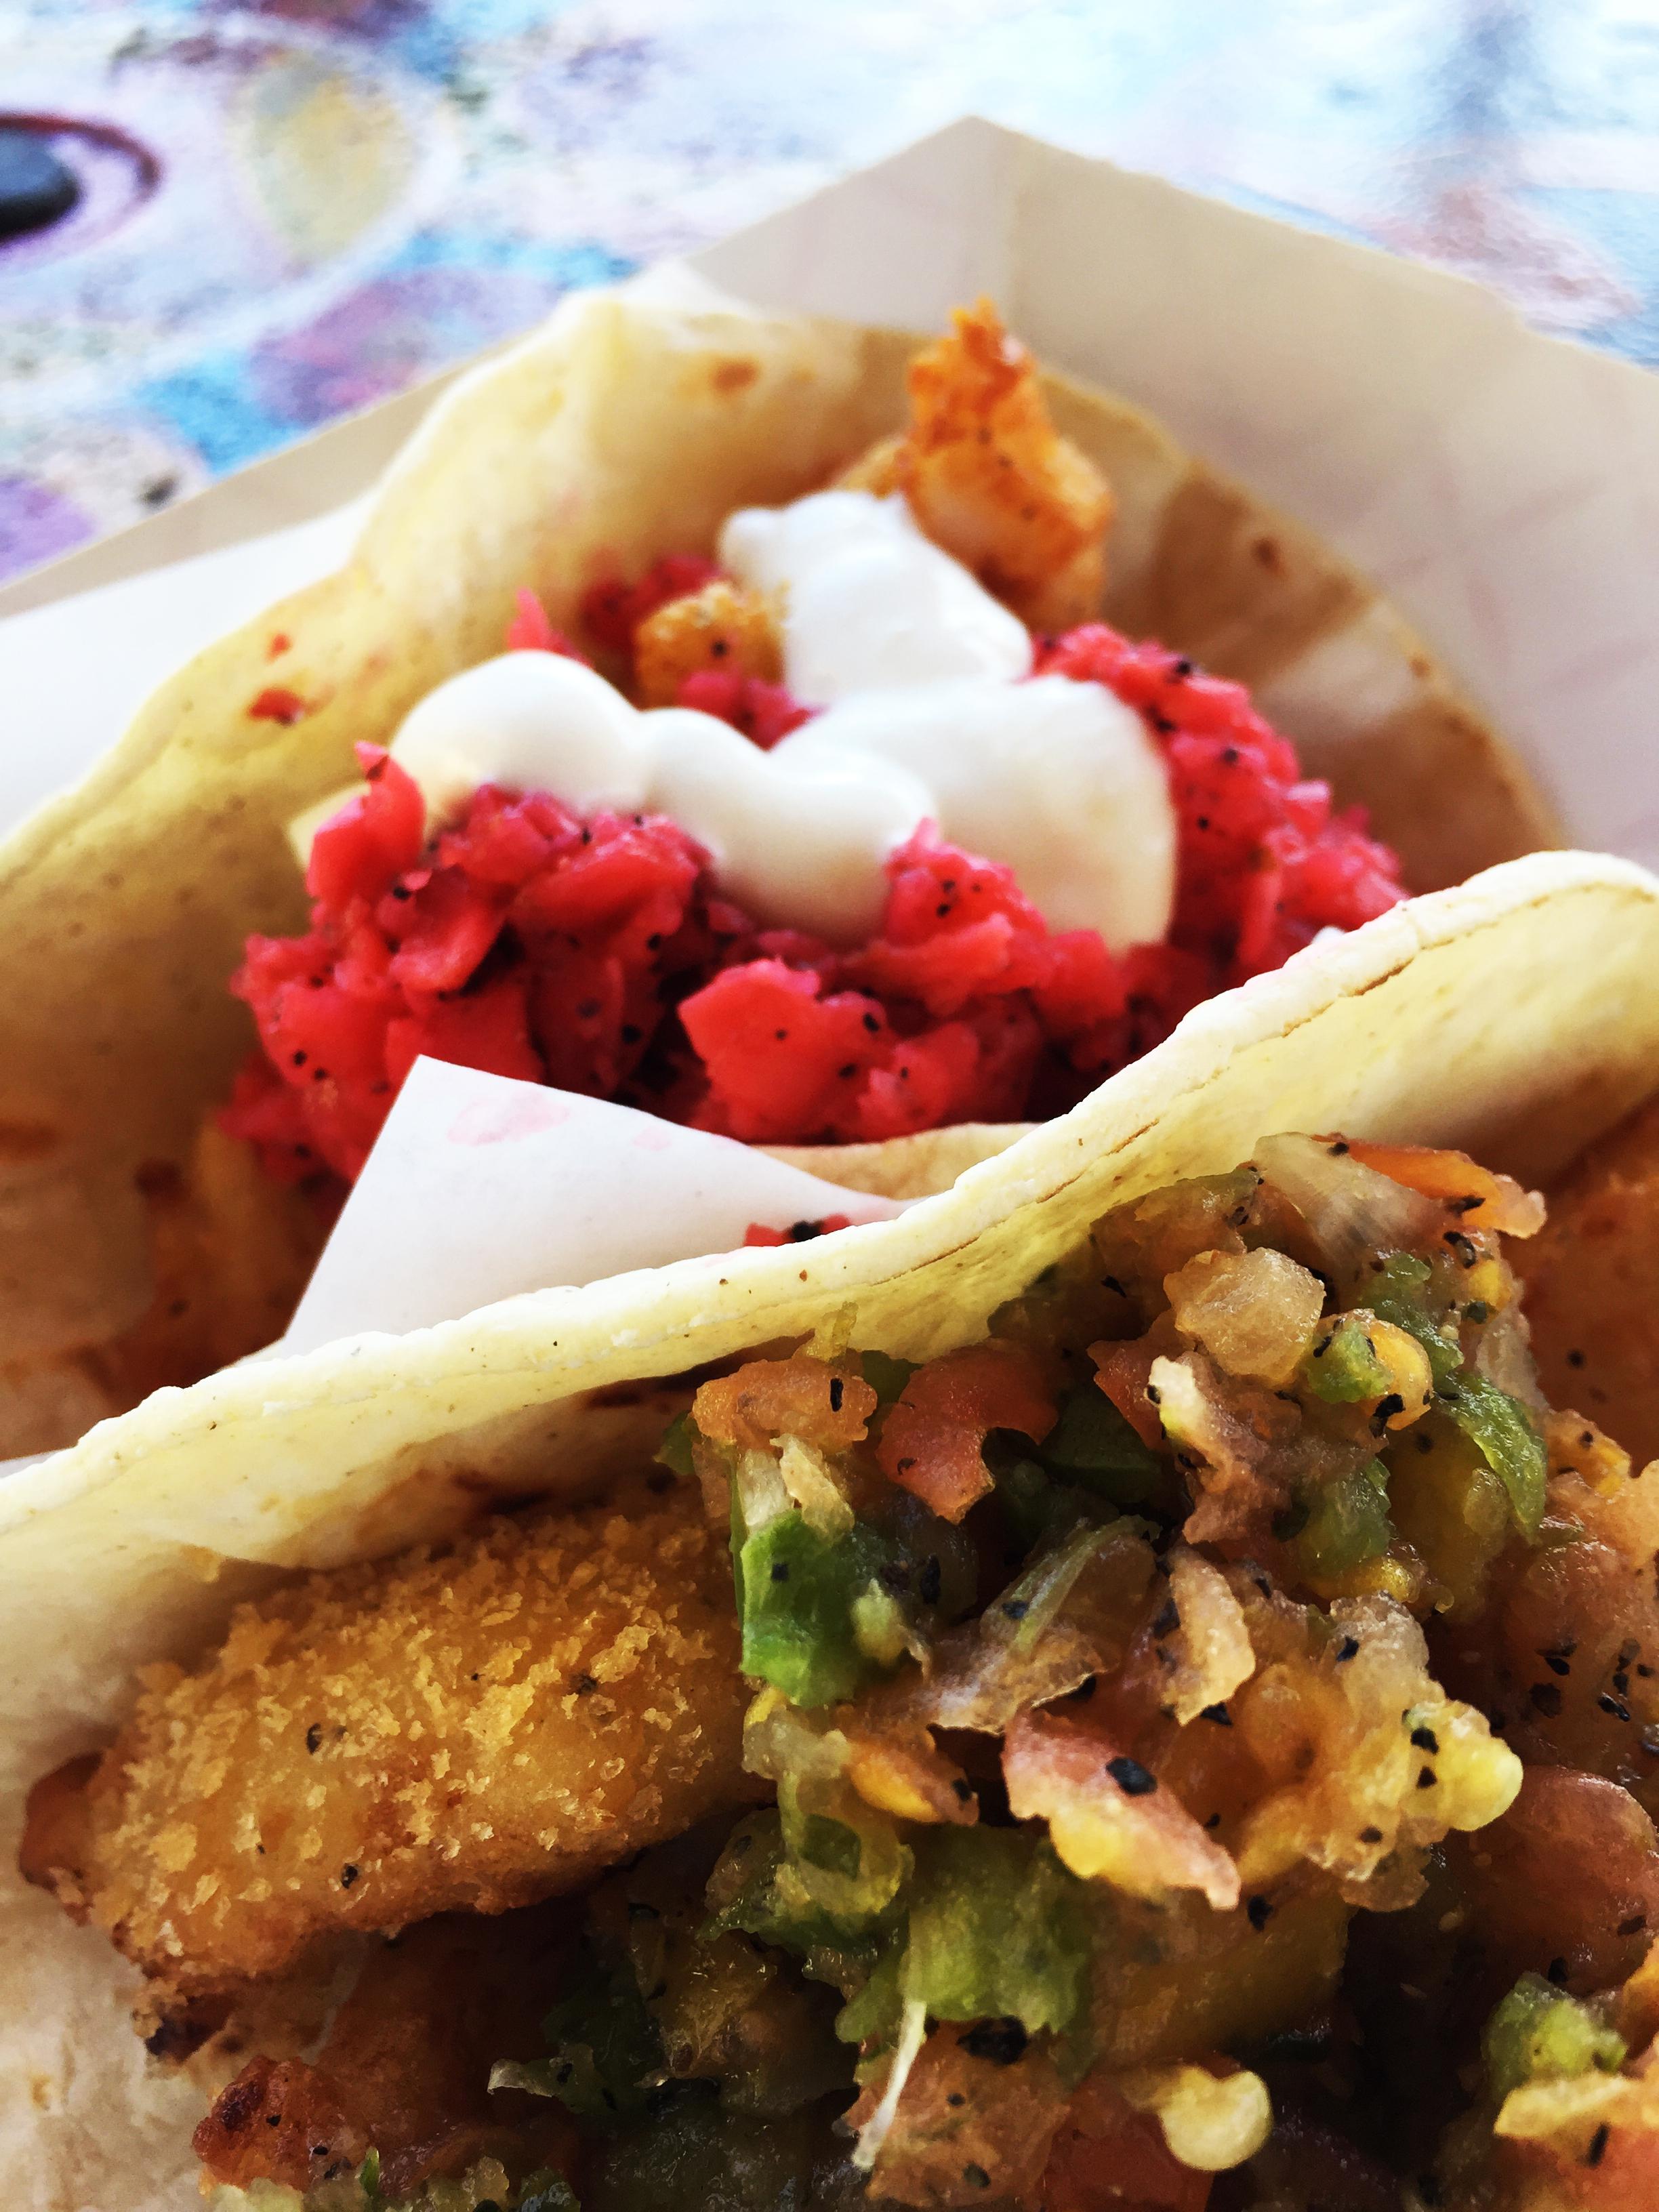 (front) Shrimp Taco with Pineapple Kiss Salsa and (back) Fish Taco with Radish Relish Salsa.